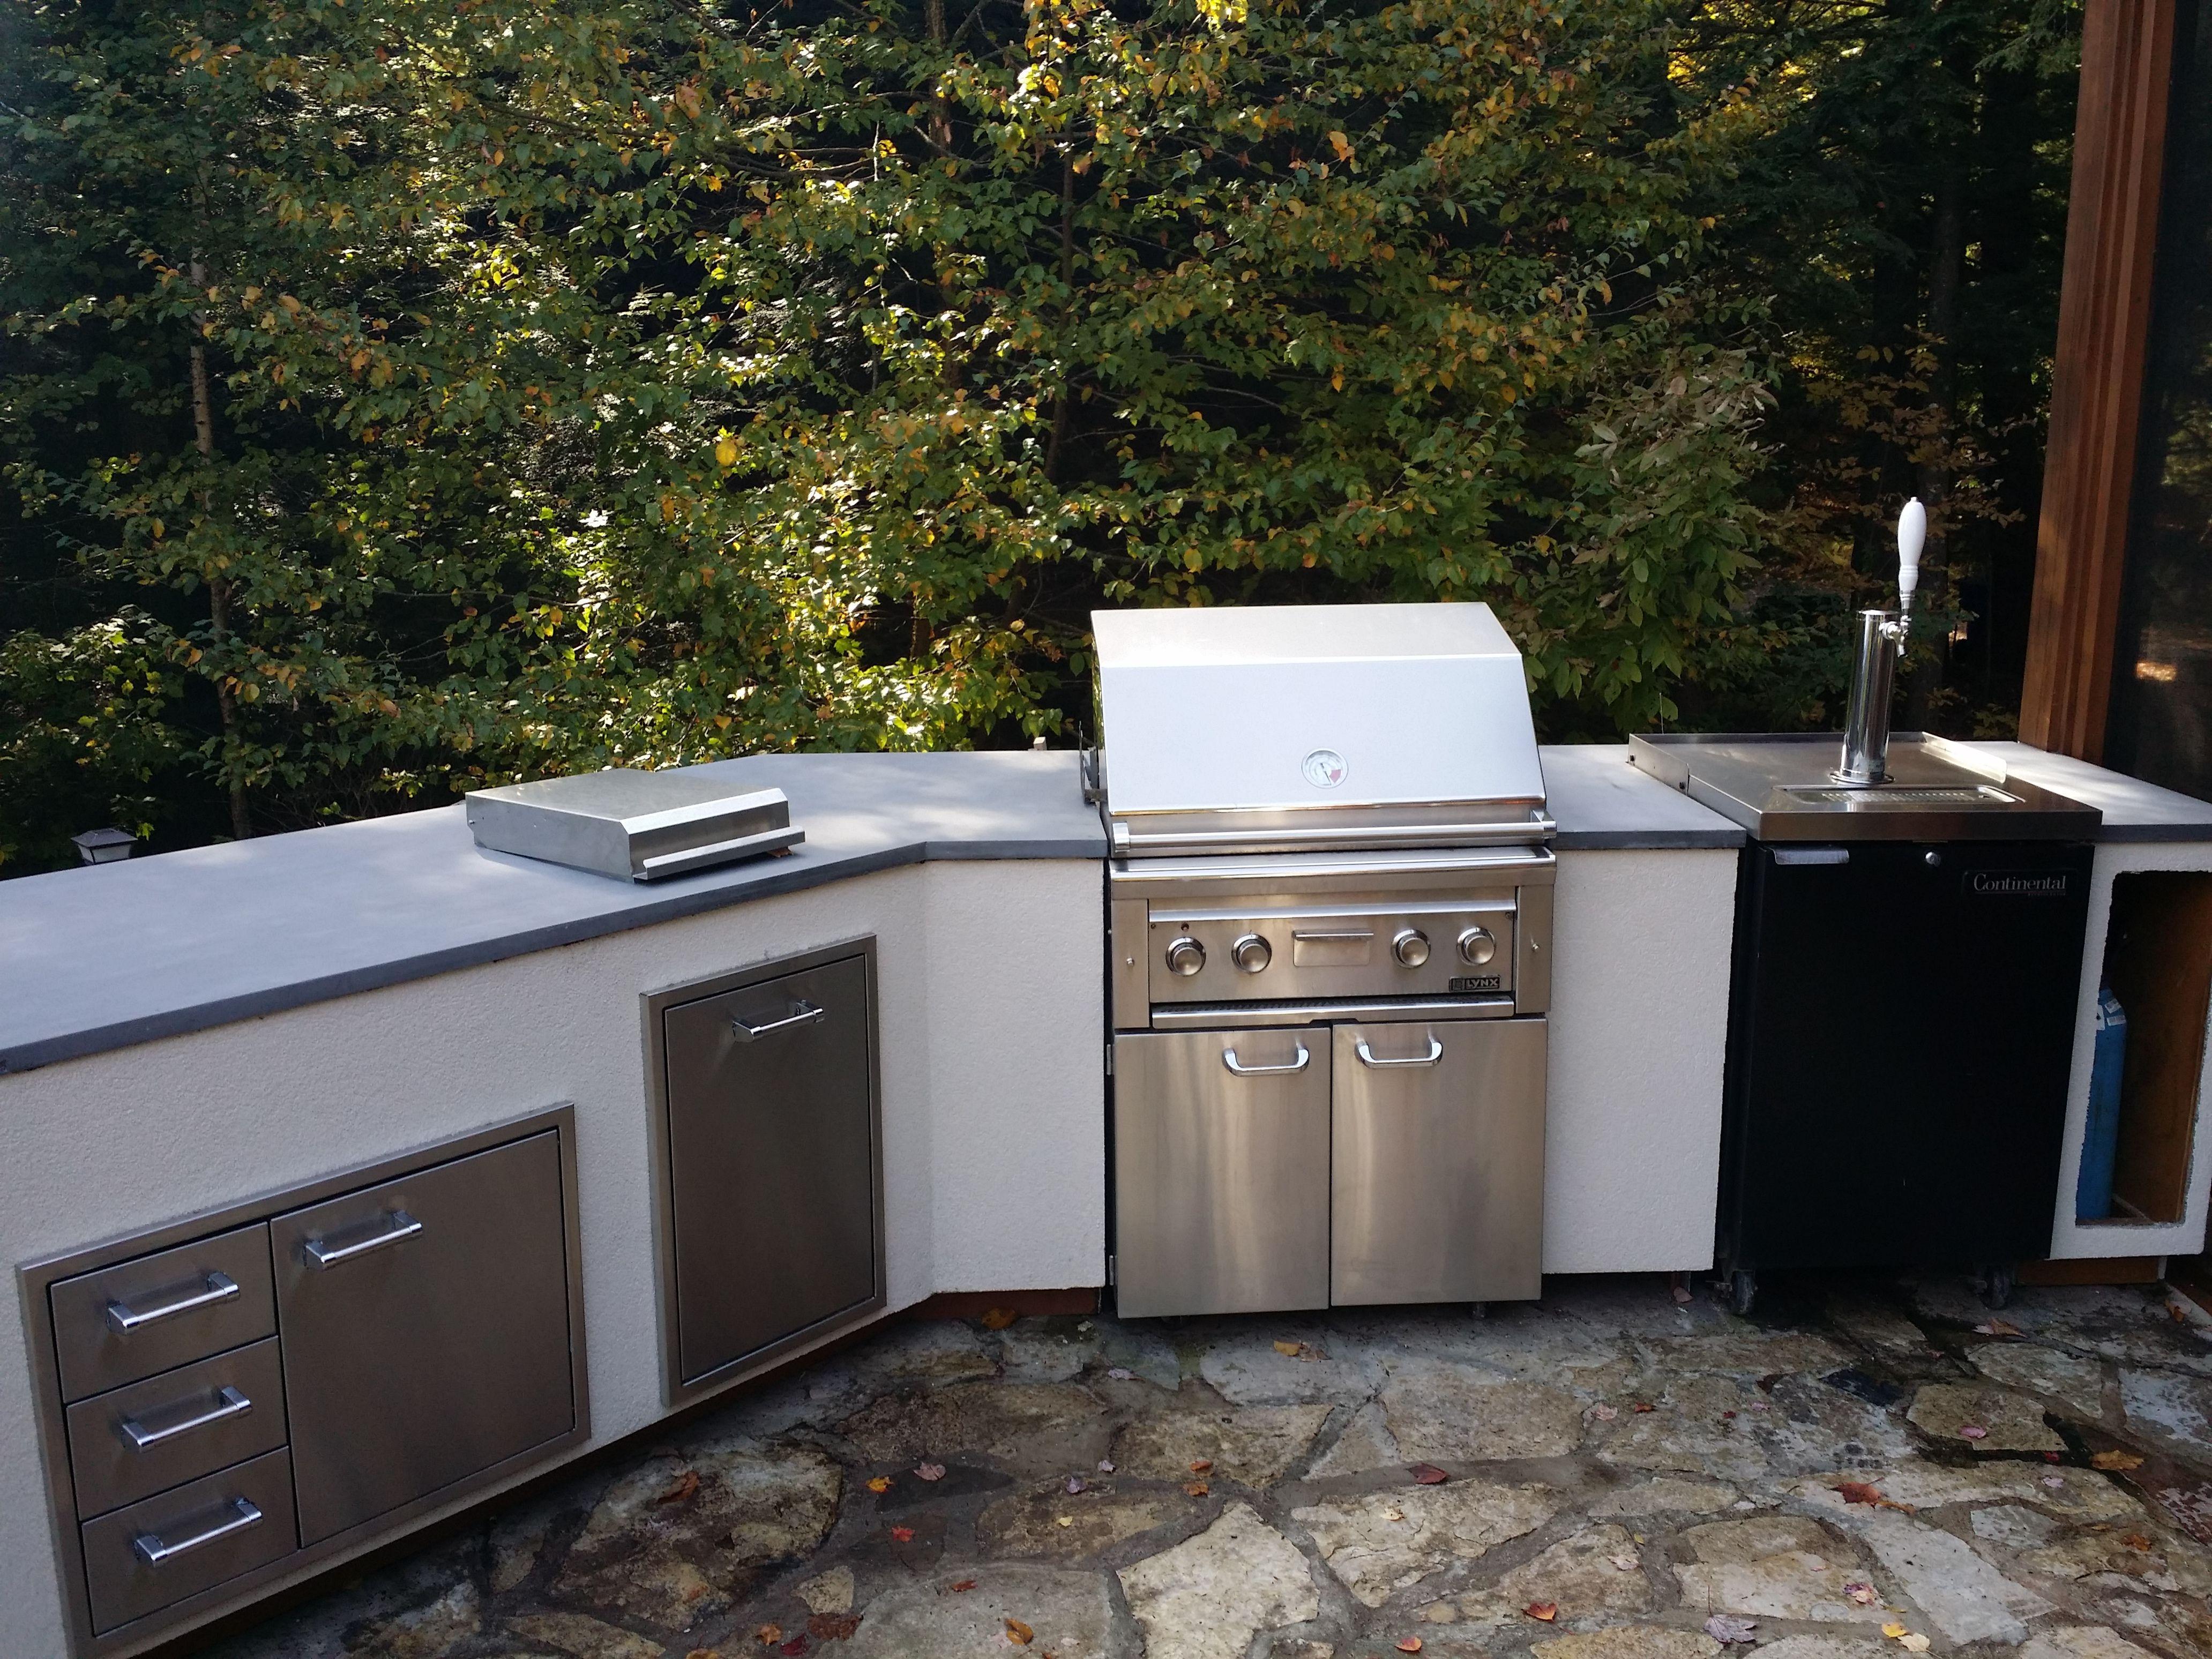 Comment Installer Un Comptoir De Cuisine comptoirs de béton en estrie | comptoirs de cuisine en béton